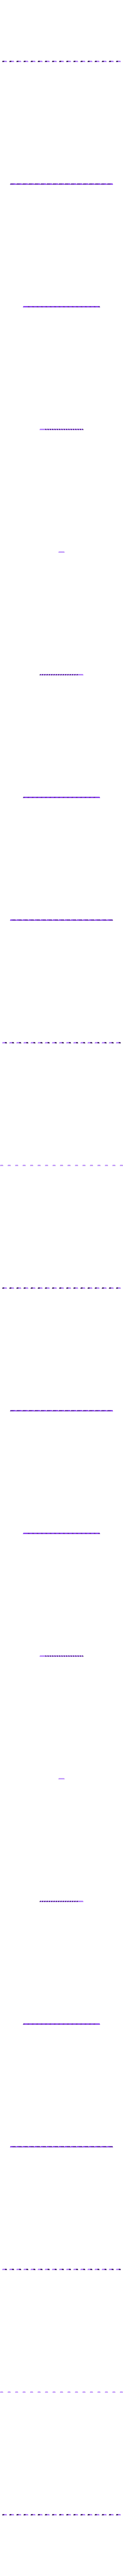 bracelet_beads_2-2.STL Download free STL file Multi-Color Bangle (Bracelet) • 3D printer template, MosaicManufacturing